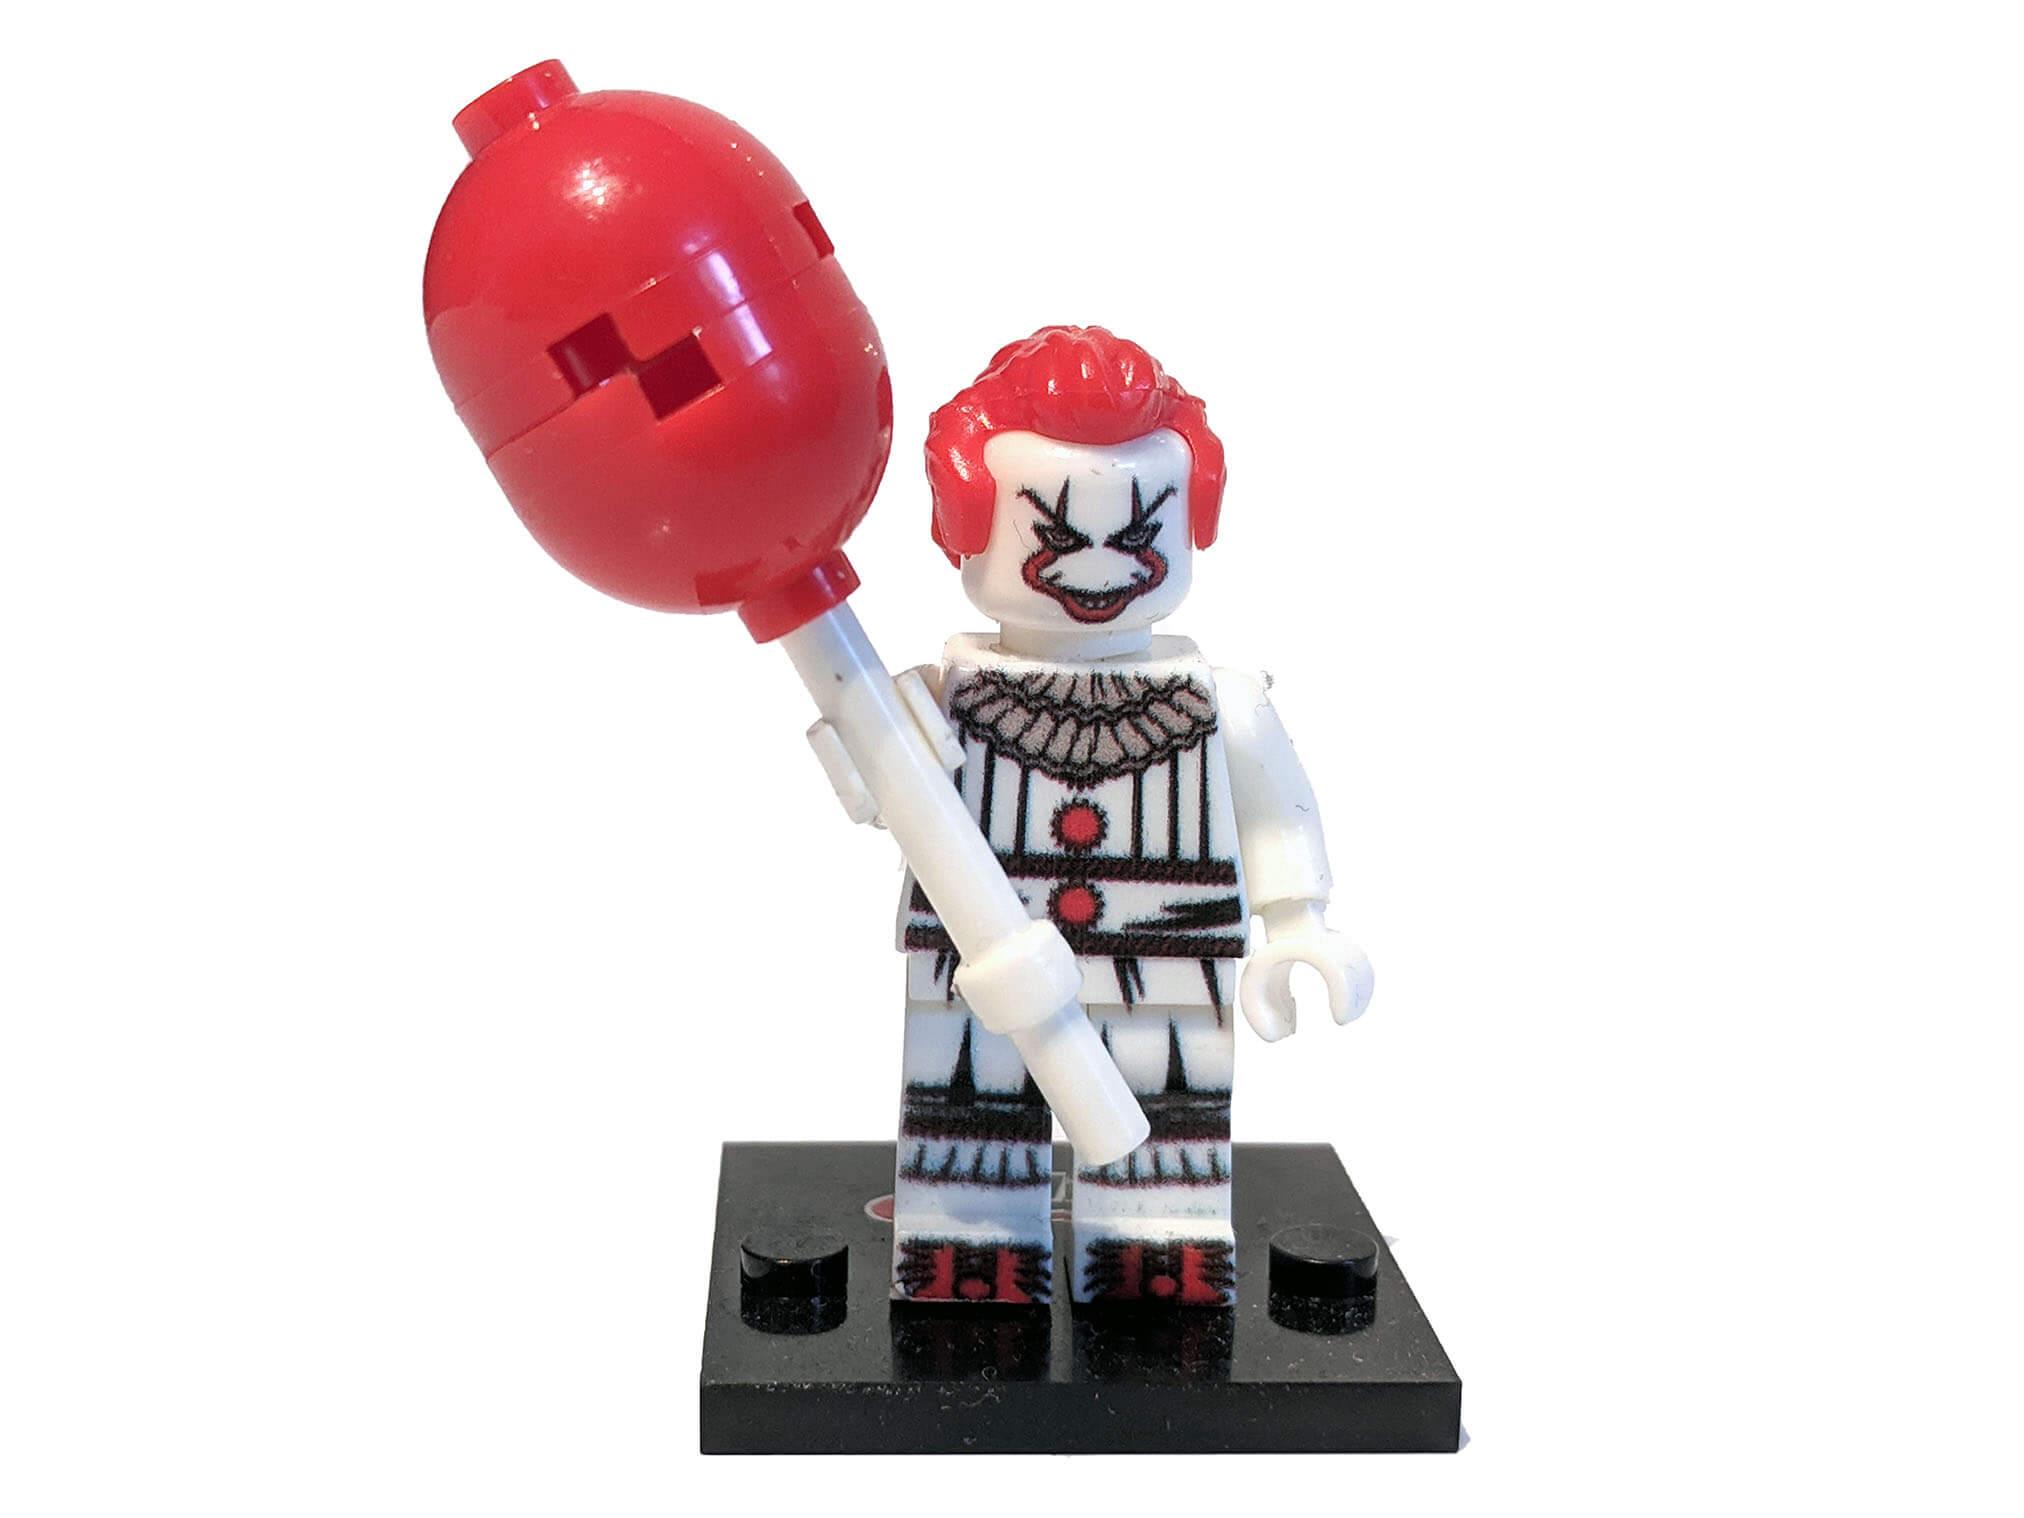 LEGO-Pennywise.jpg